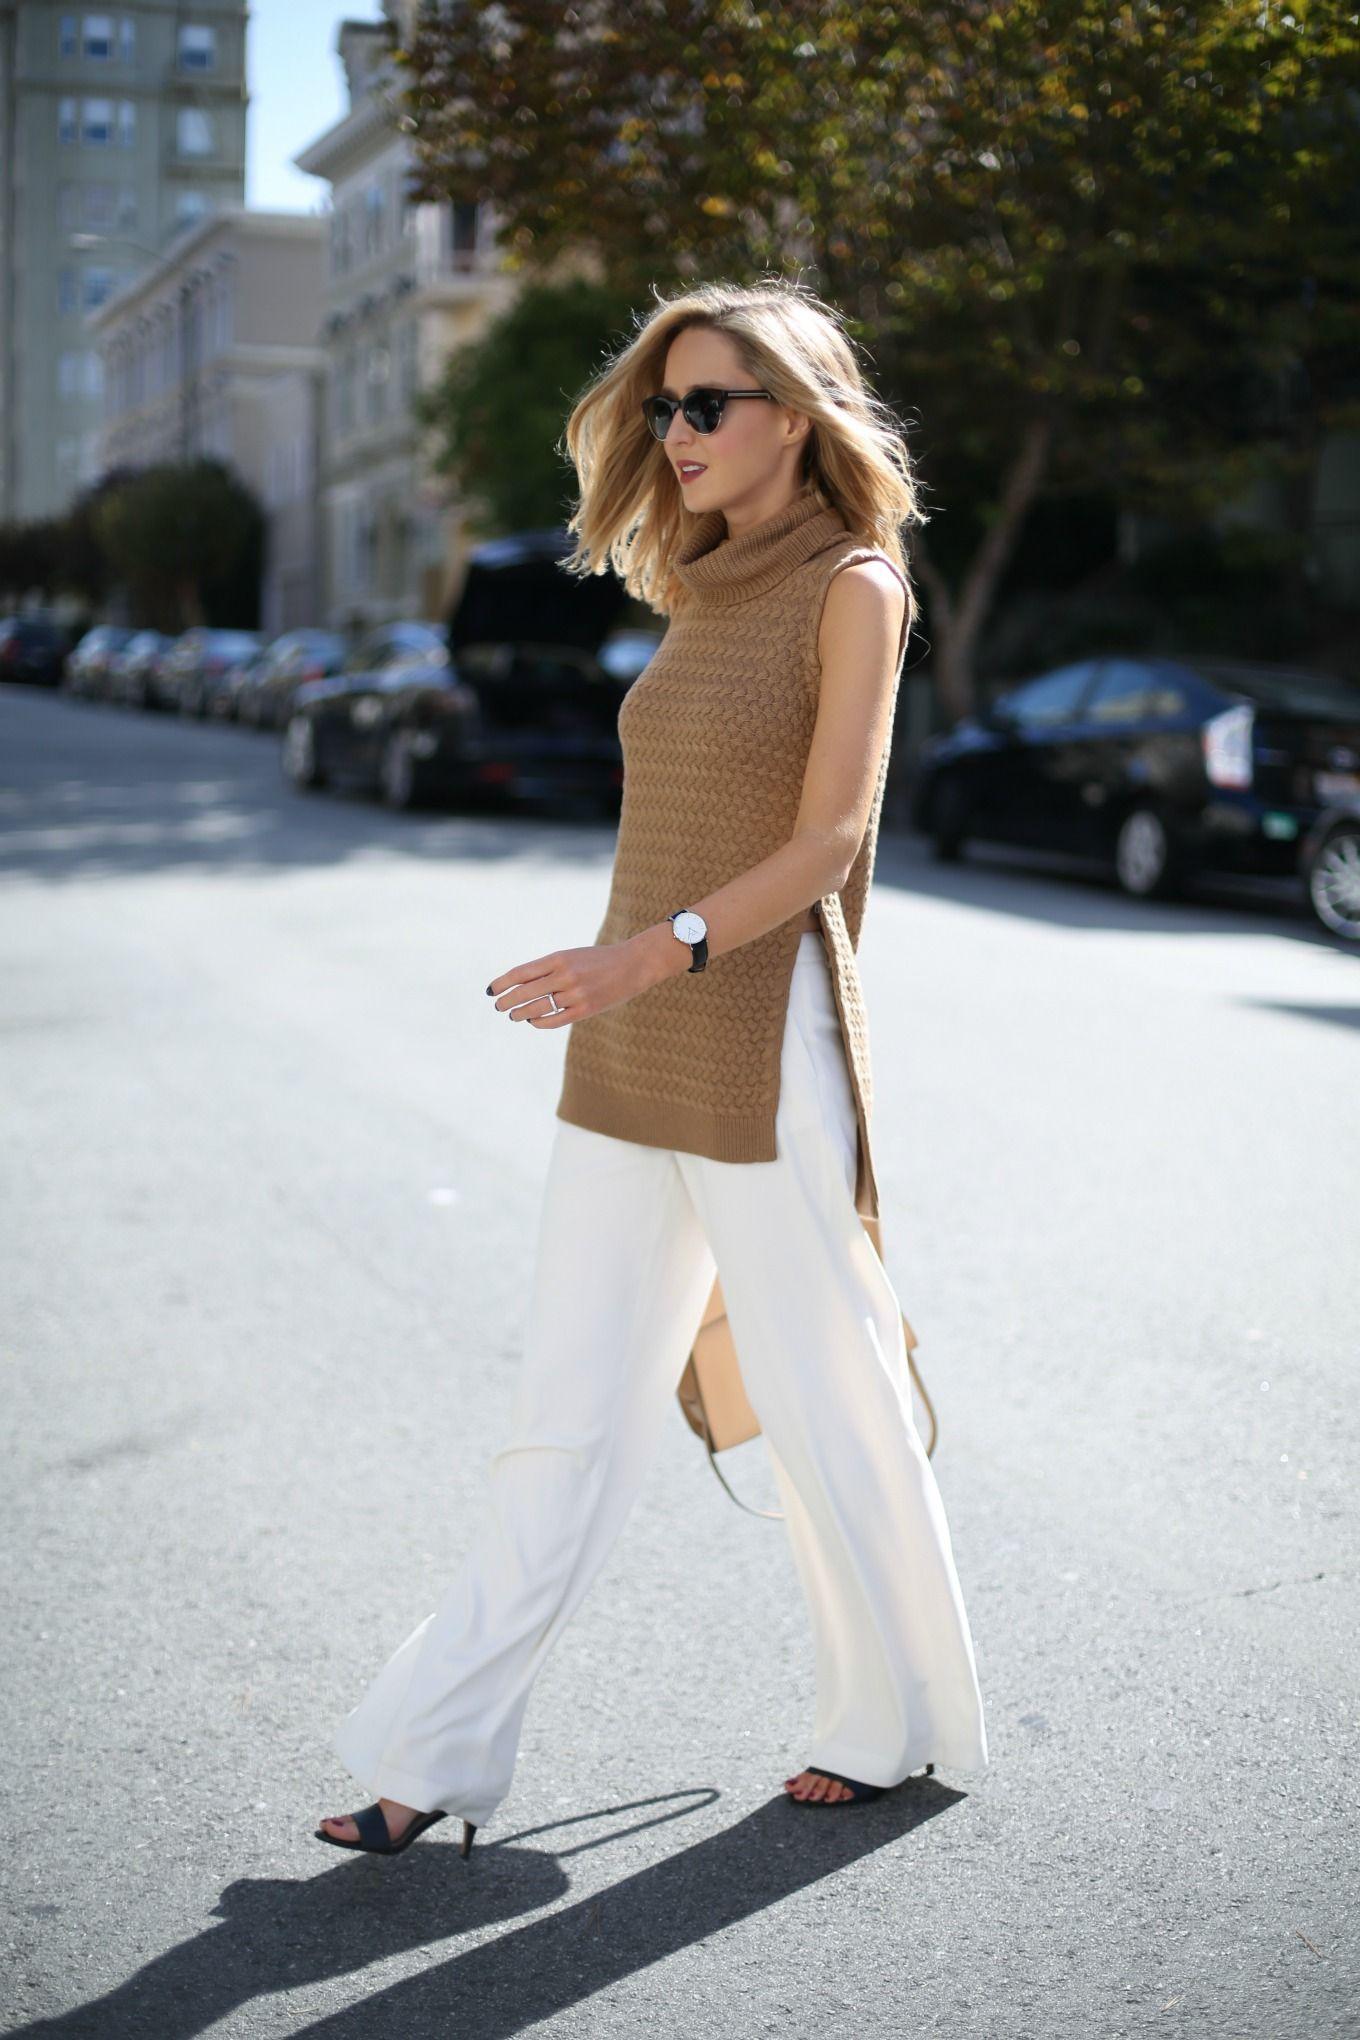 f camel cableknit turtleneck sleeveless tunic sweater chunky knit ...